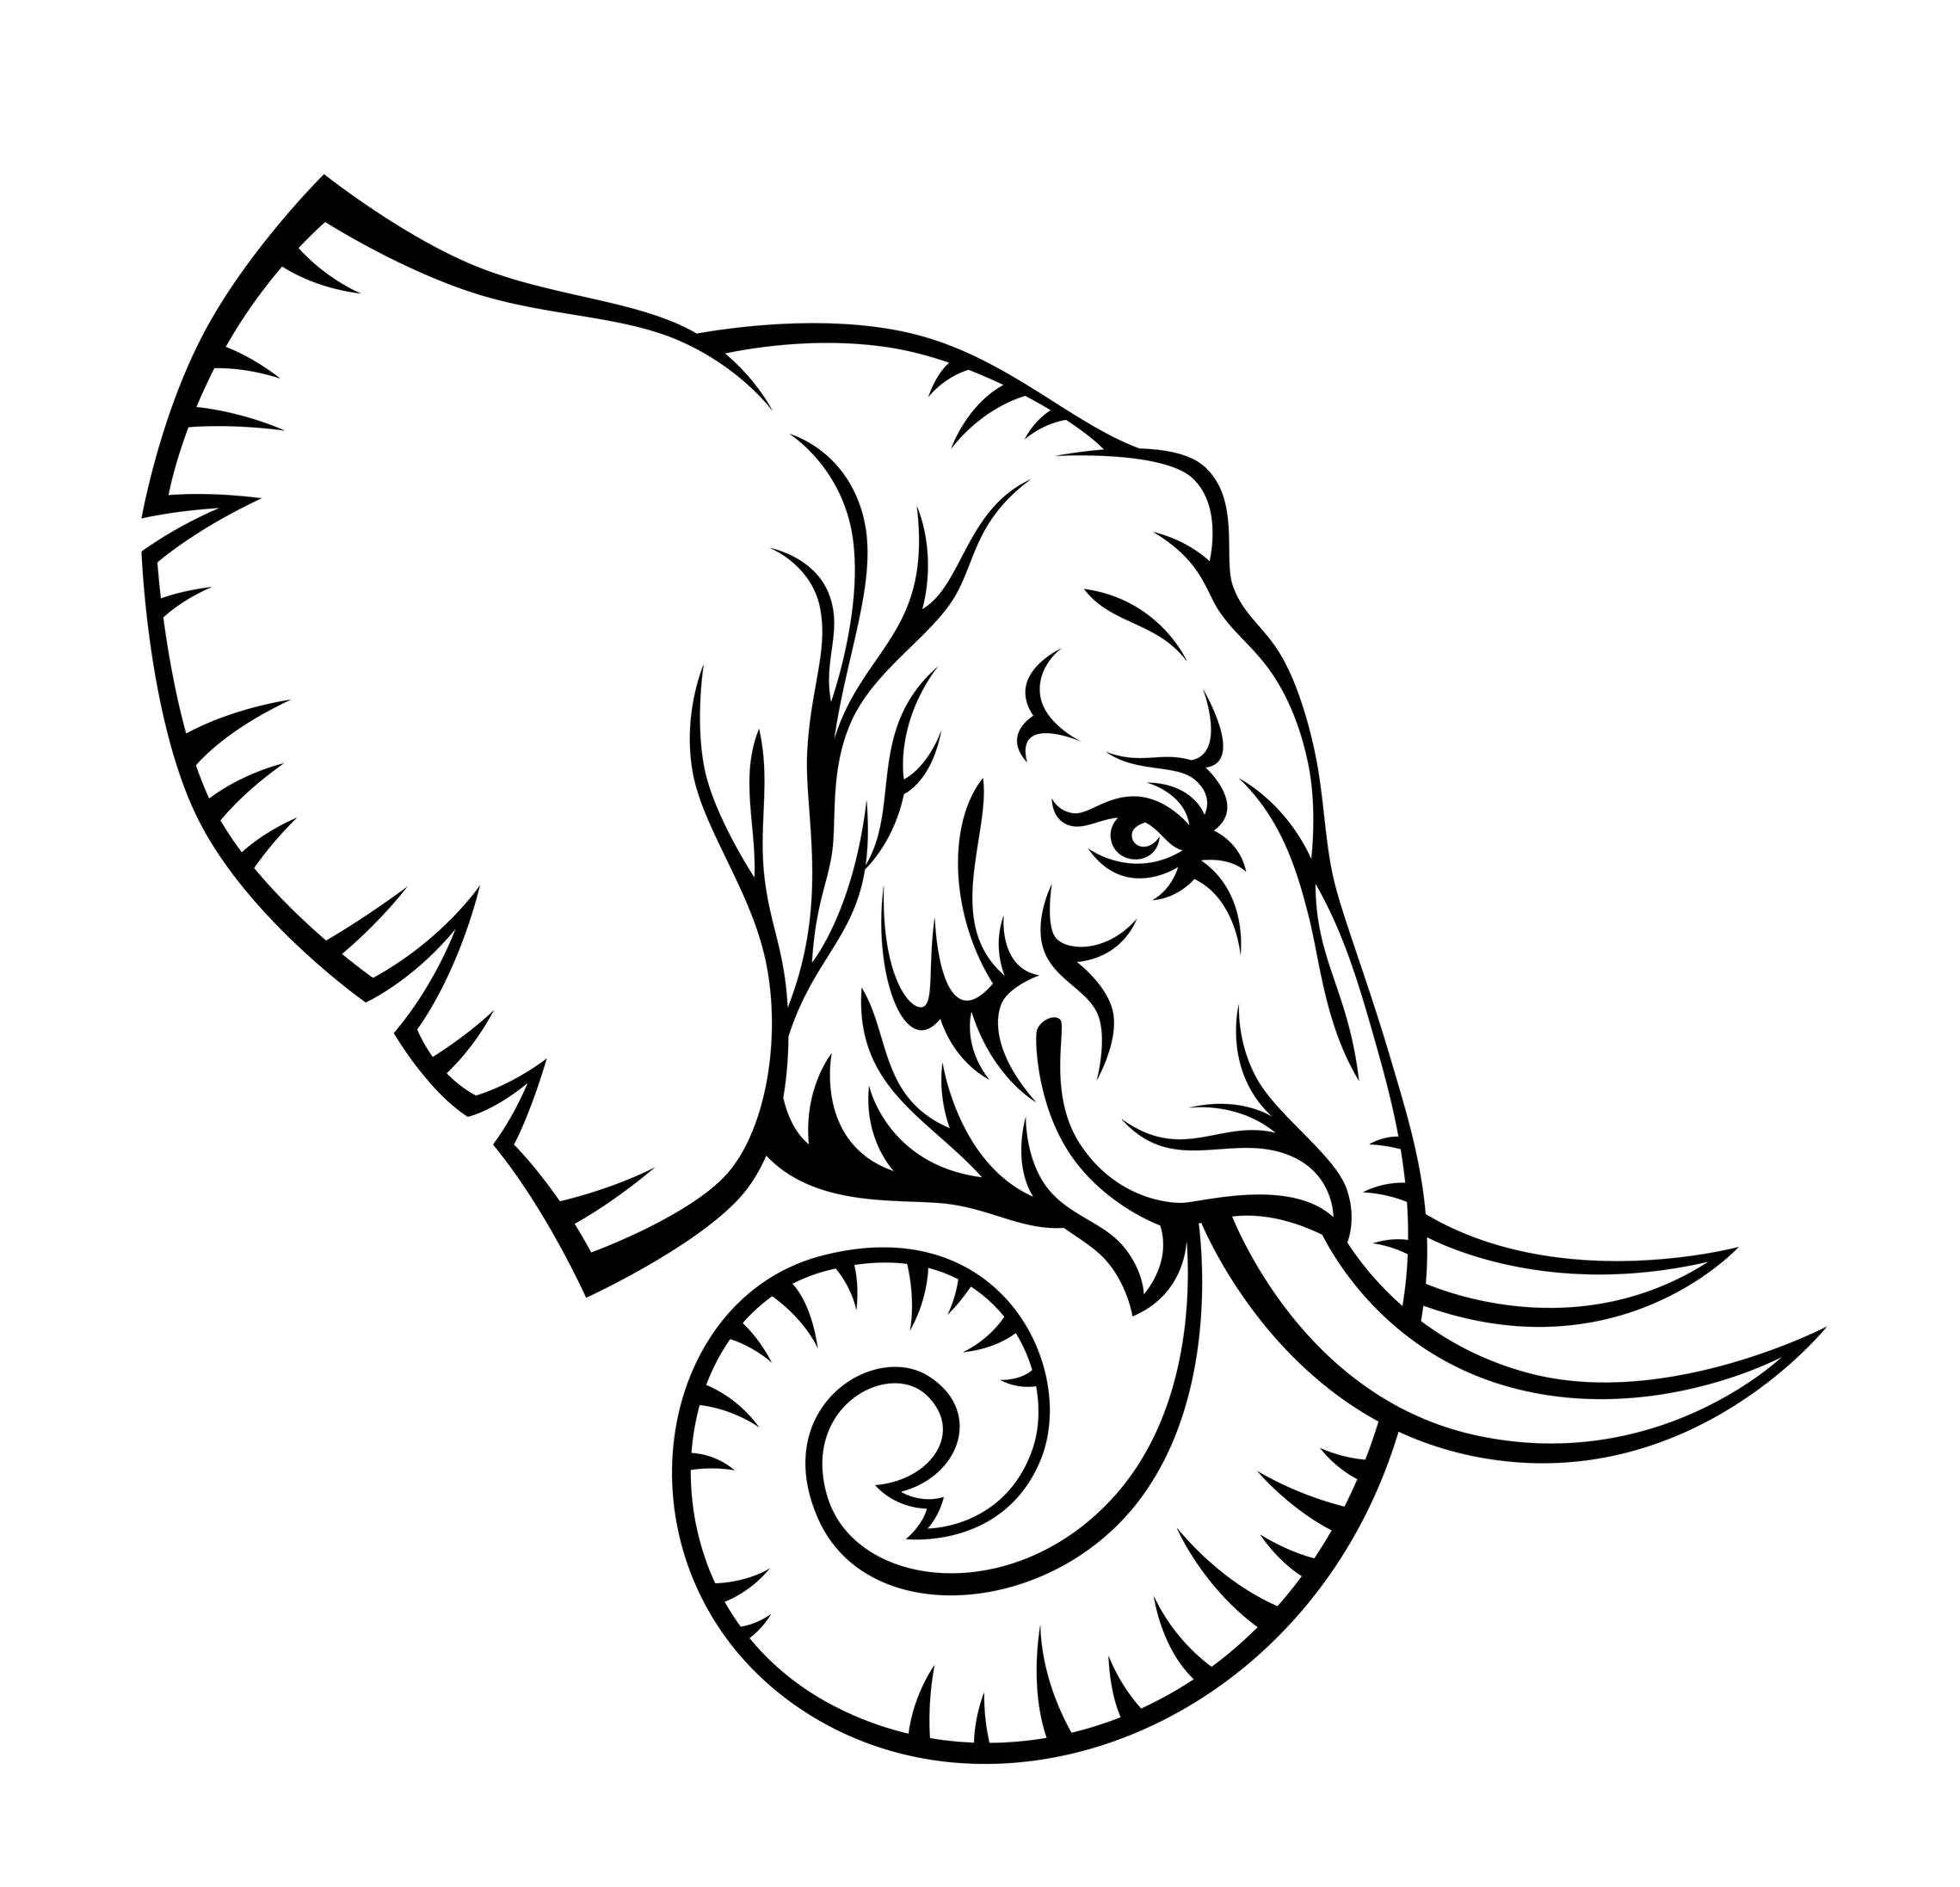 2278x2193 Elephant Tattoo Designs And Ideas